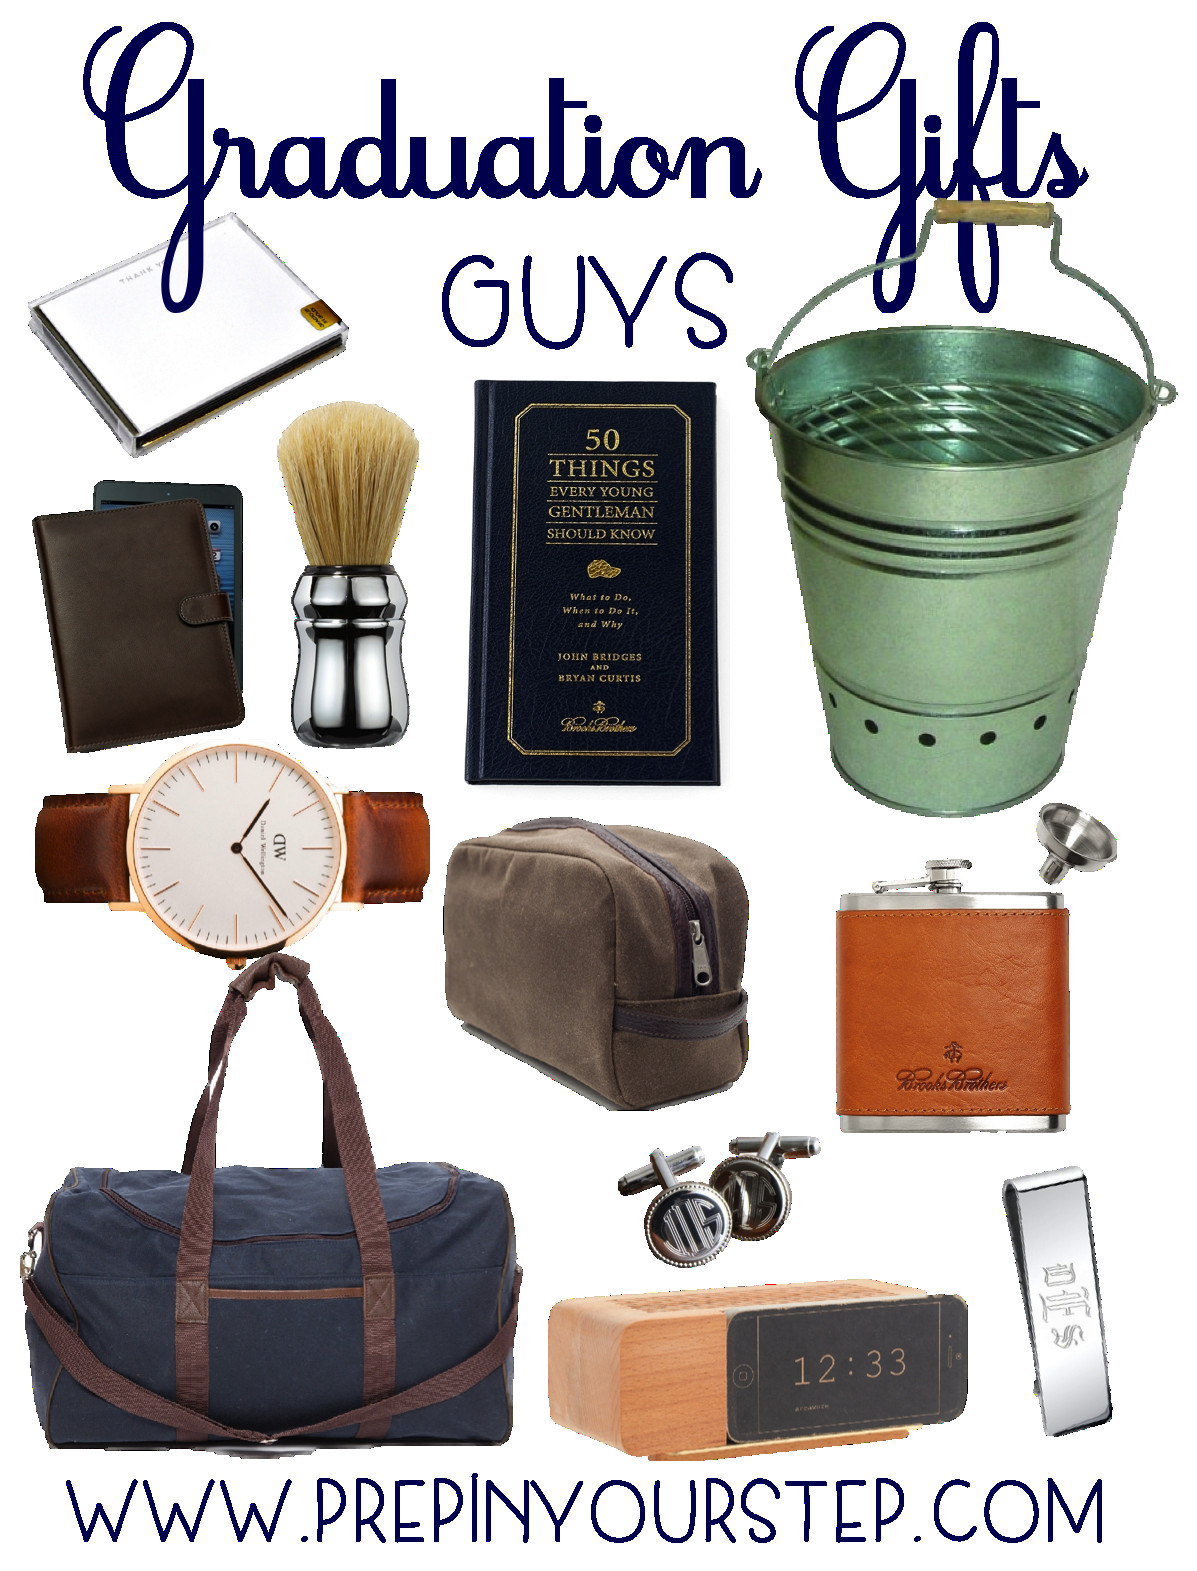 High School Graduation Gift Ideas For Guys  Graduation Gift Ideas Guys & Girls